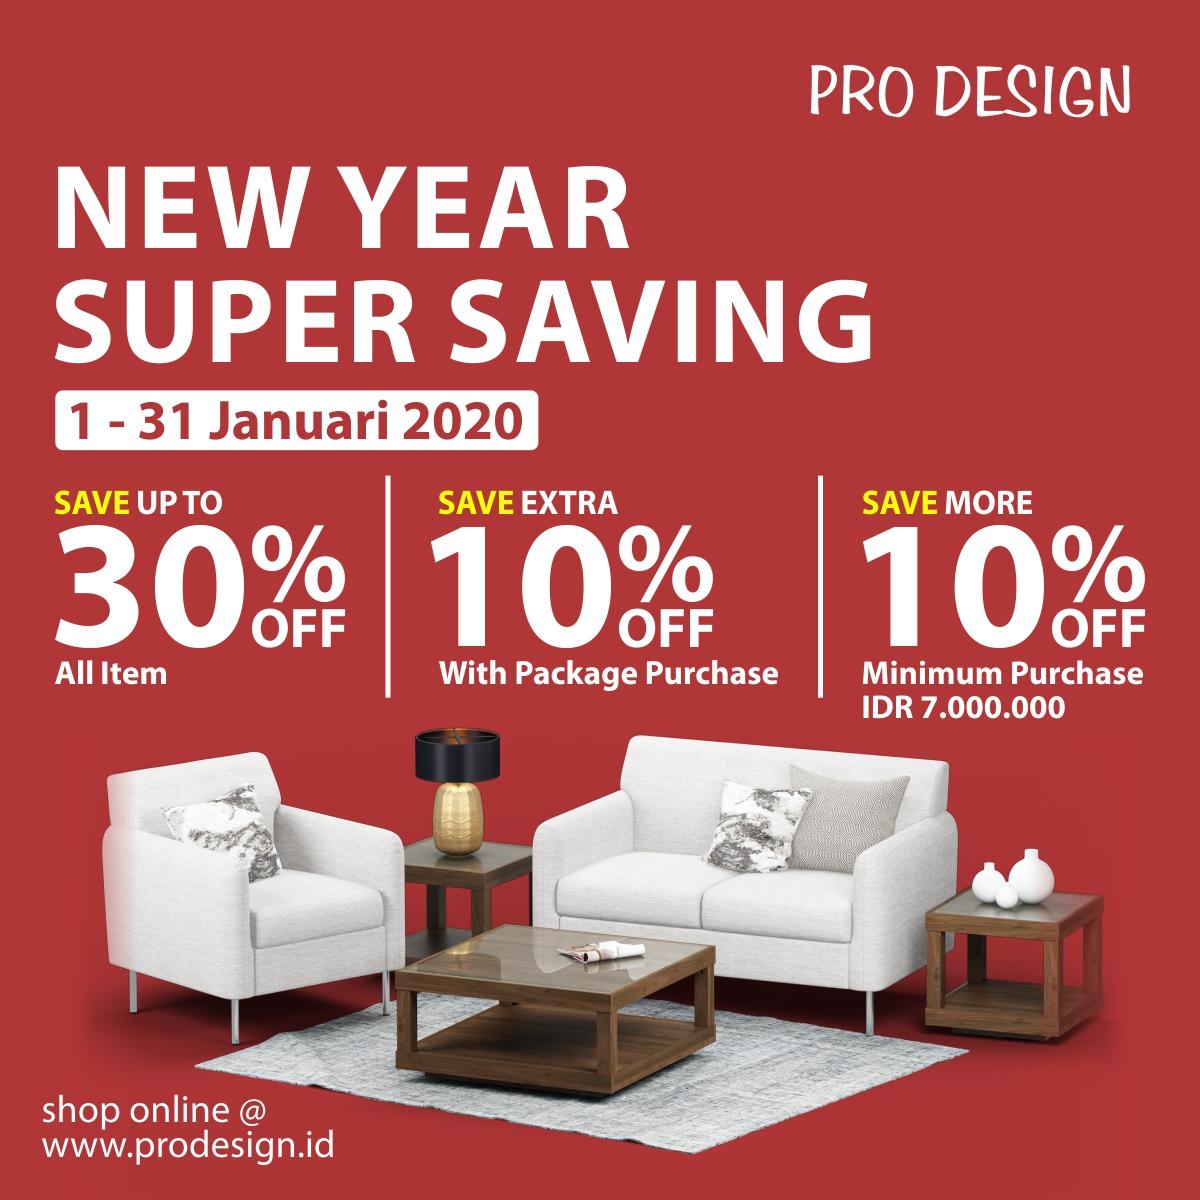 À¦Ÿ À¦‡à¦Ÿ À¦° Pro Design Furniture New Year Super Saving Tahun Baru Semangat Baru Furniture Baru Dapatkan Promo Awal Tahun Pro Design Diskon Hingga 30 Untuk Seluruh Item Tunggu Apalagi Wujudkan Resolusi